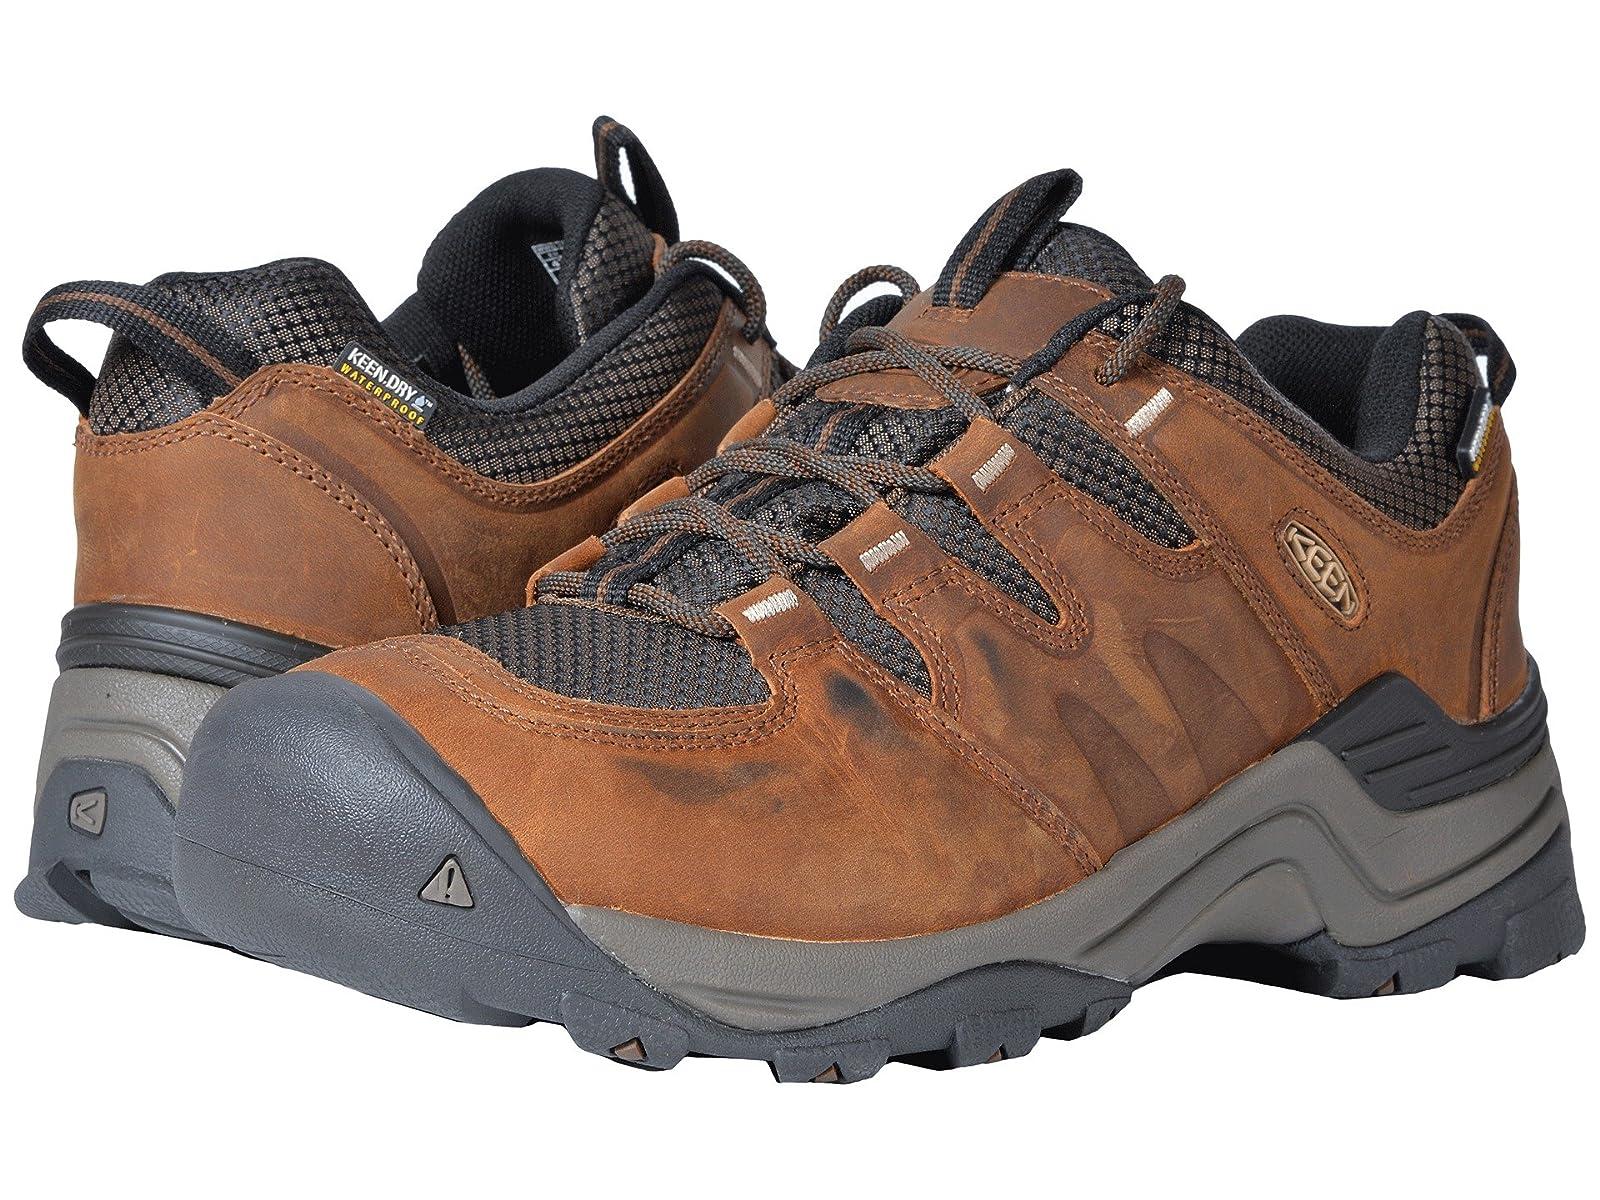 Keen Gypsum II WaterproofCheap and distinctive eye-catching shoes